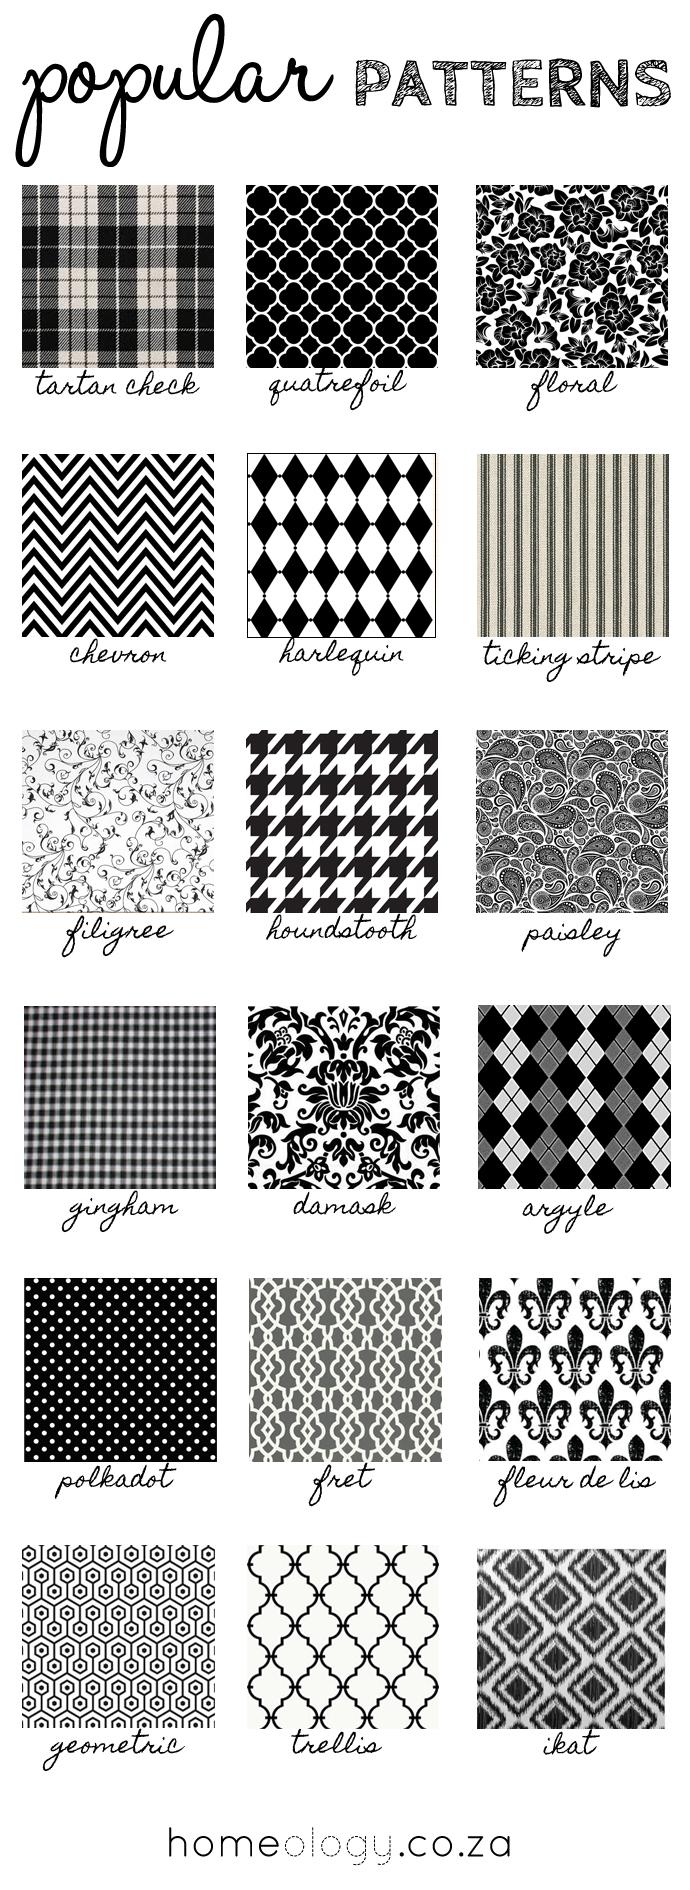 Popular Pattern